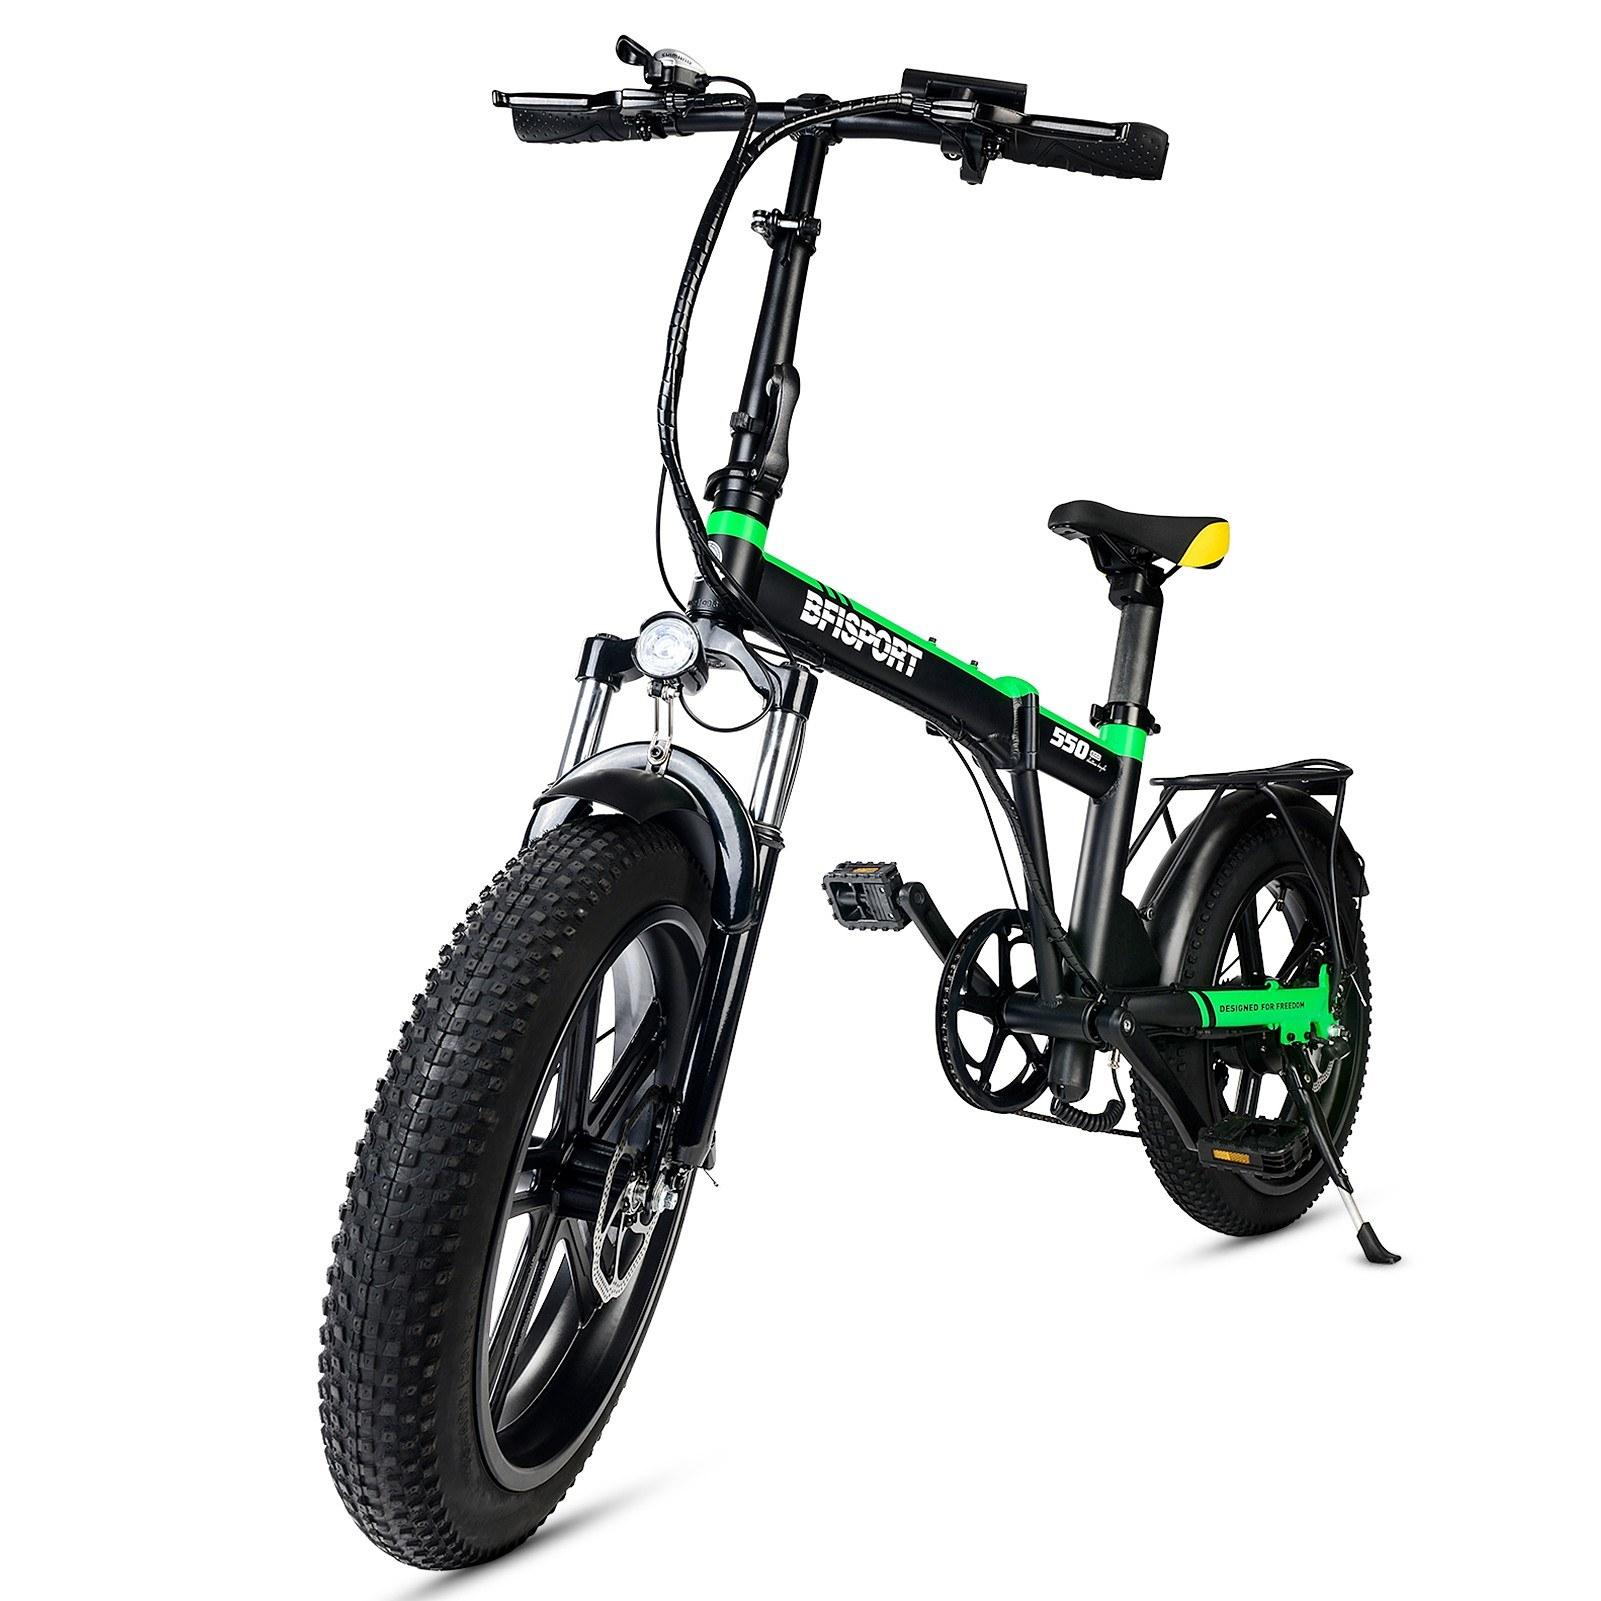 tomtop.com - [EU Warehouse] 46% OFF BFISPORT EB20-02F Folding Electric Bike, $759.99 (Inclusive of VAT)